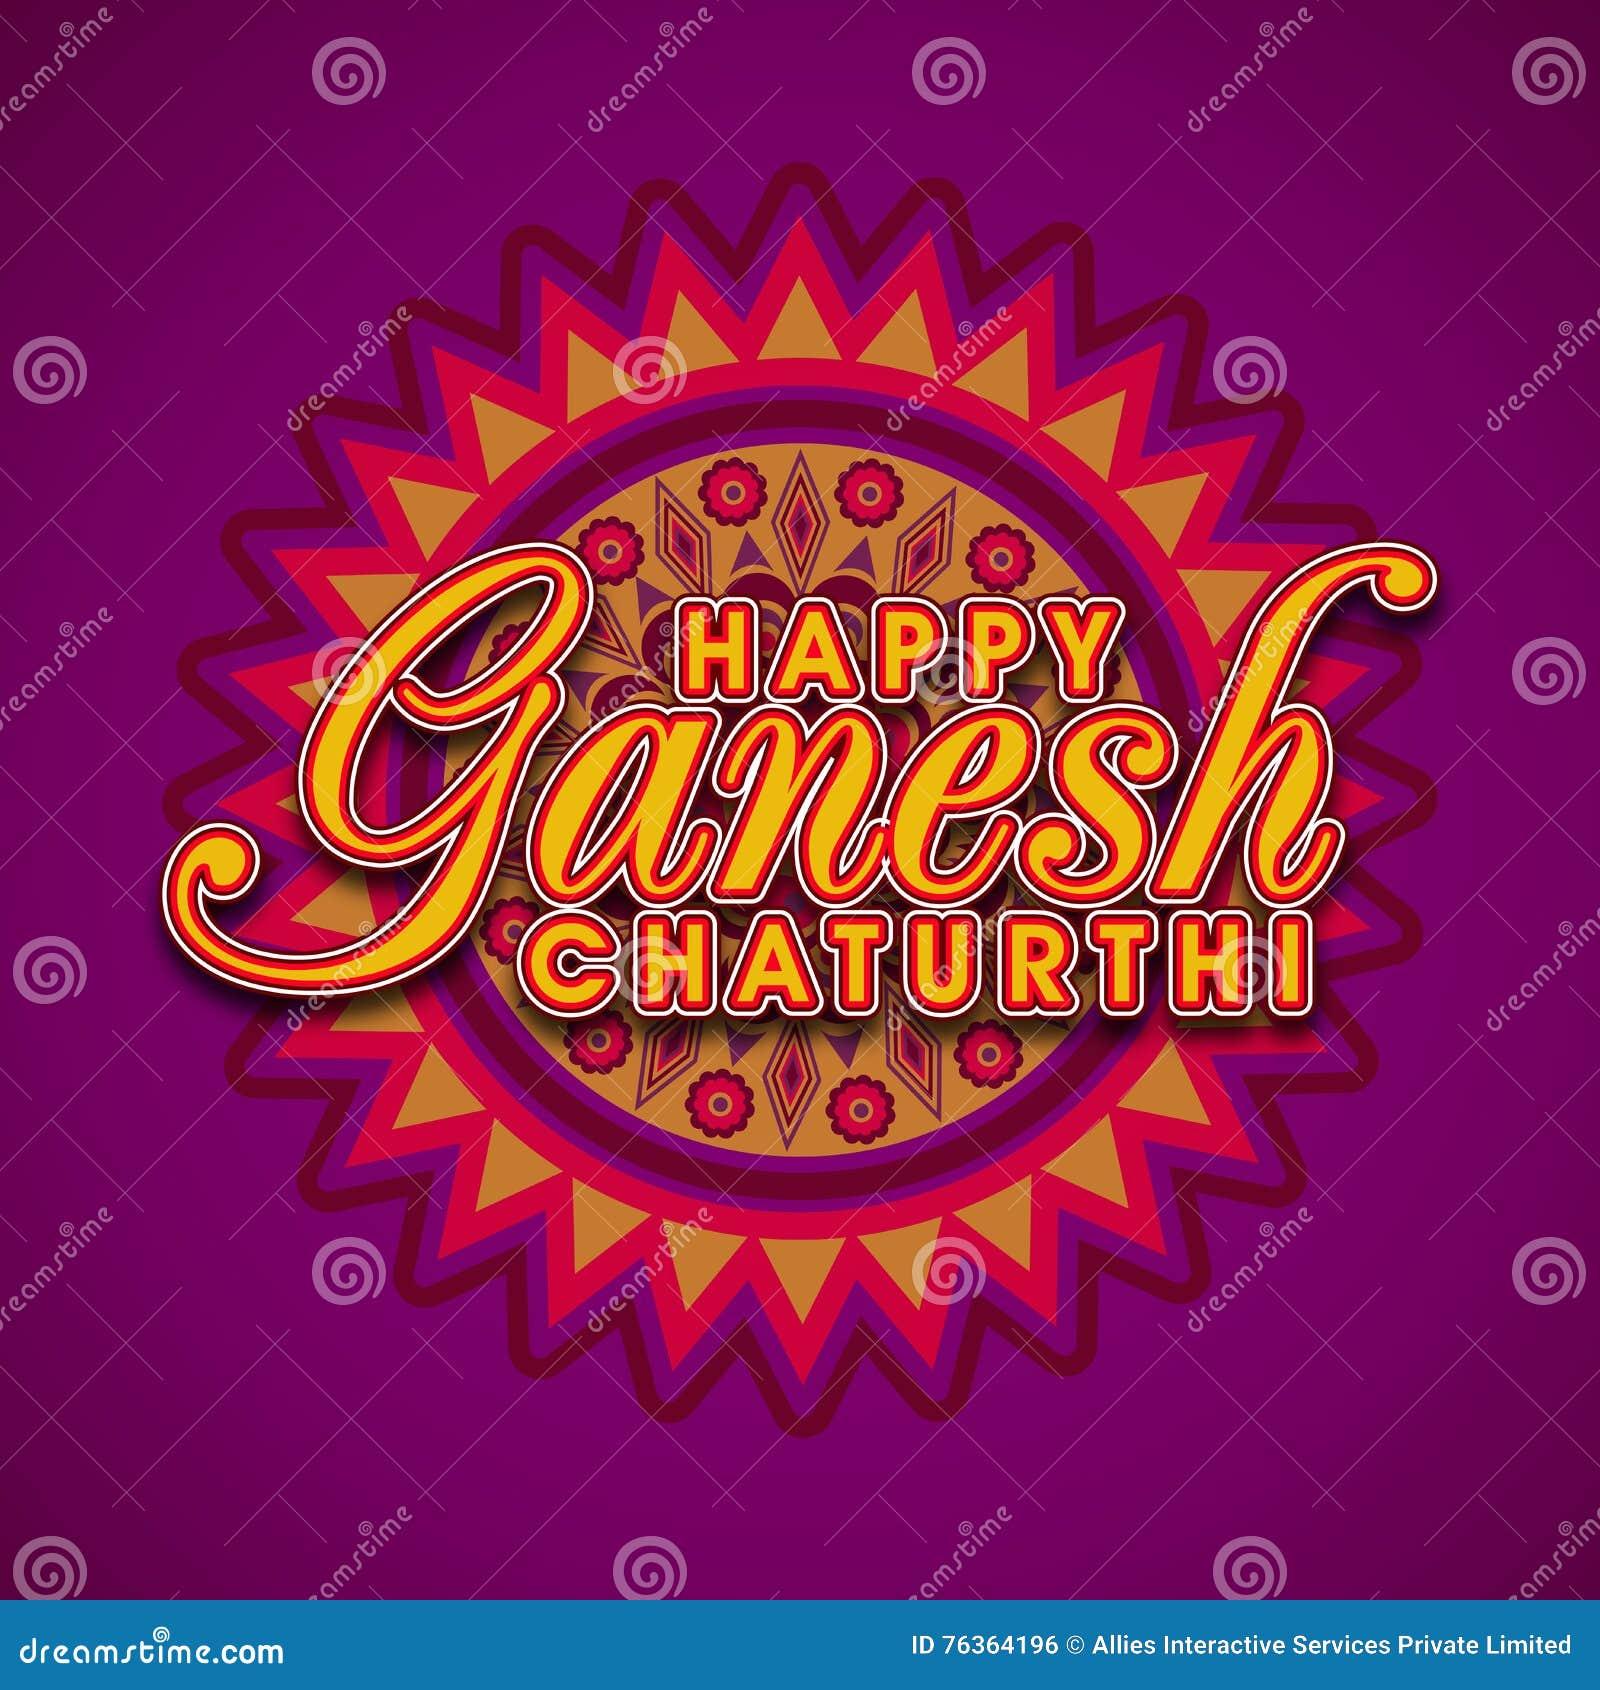 Happy Ganesh Chaturthi Greeting Design Cartoon Vector